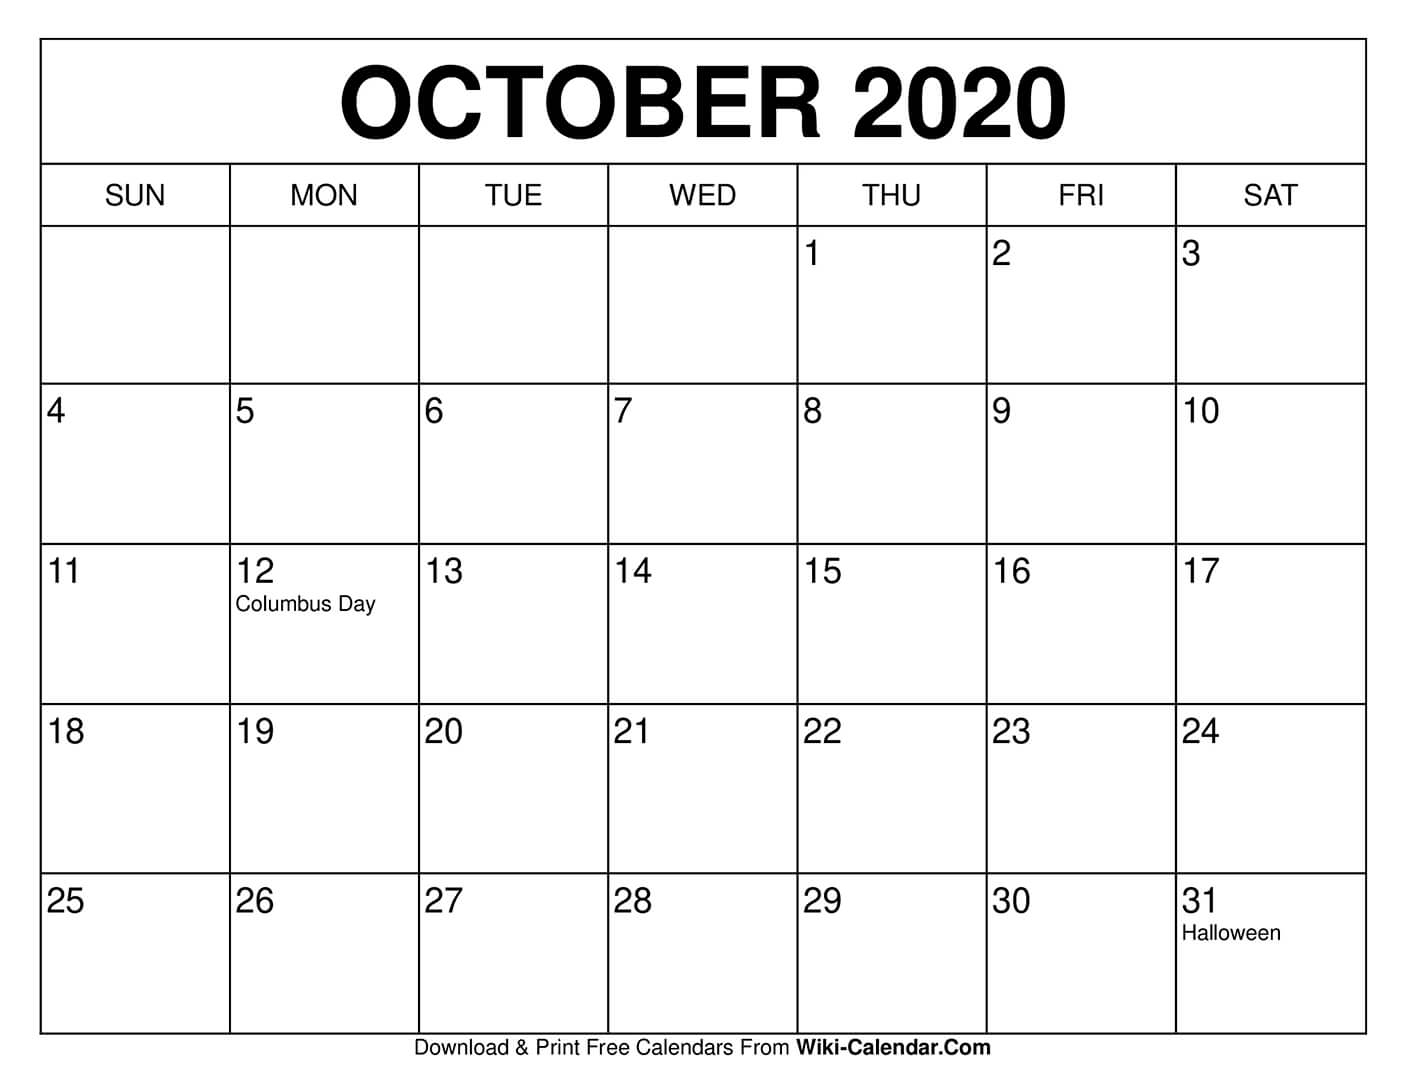 Free Printable October 2020 Calendars pertaining to Vertex Montly Calendar October 2020